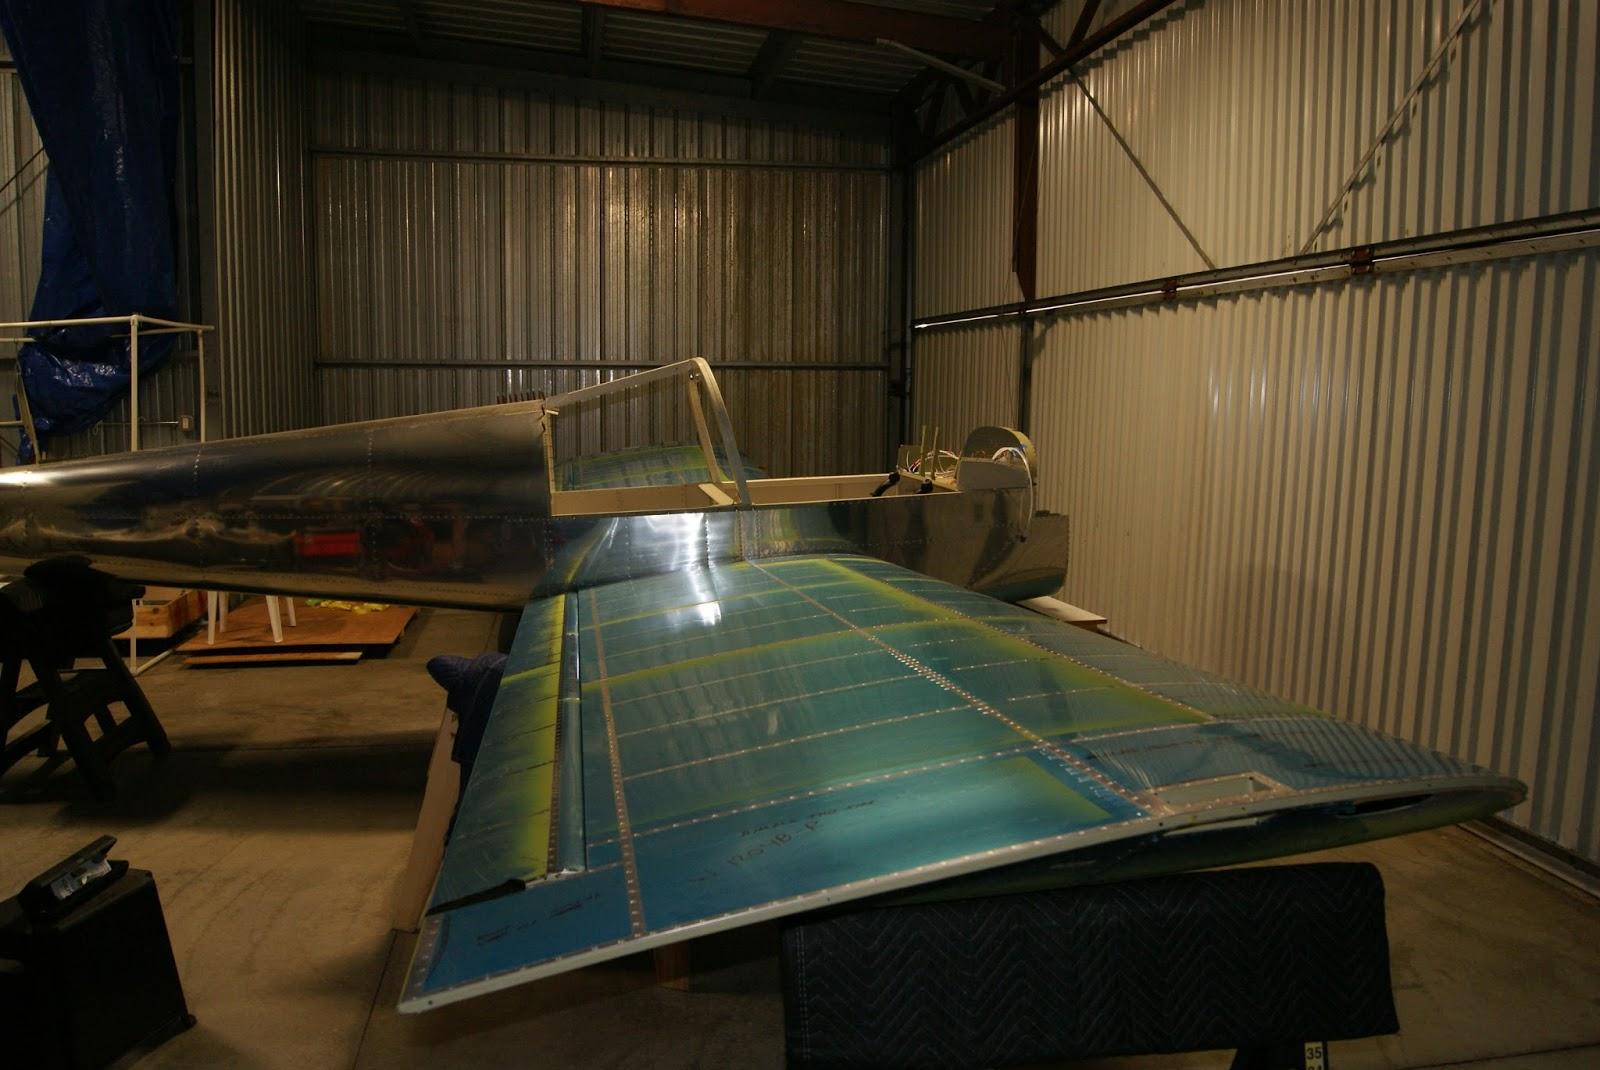 DOG Aviation John's RV-12 Blog: Match Drilling The WD-1214 Flaperon on